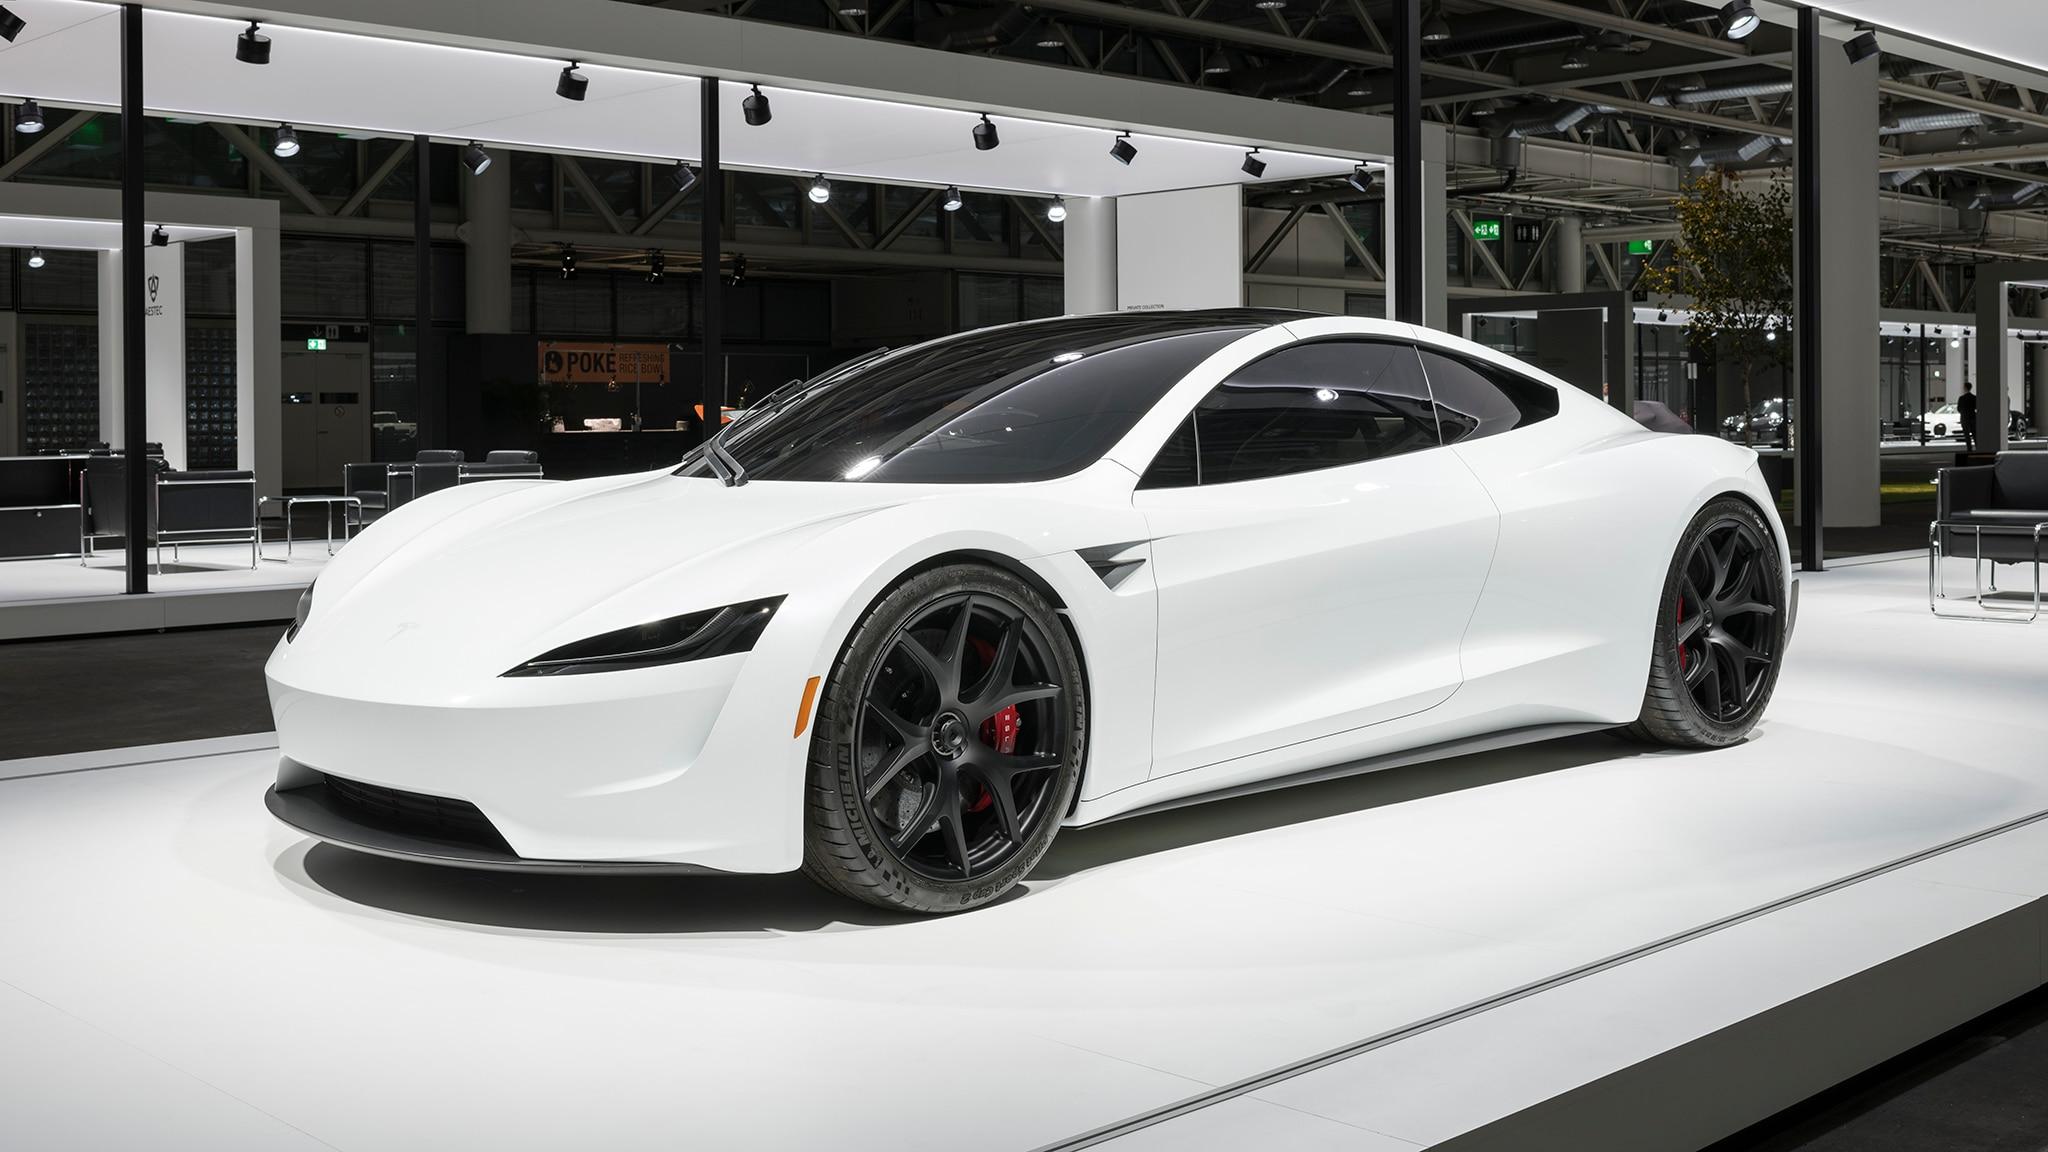 2020 Tesla Roadster Makes European Debut Dressed in White ...